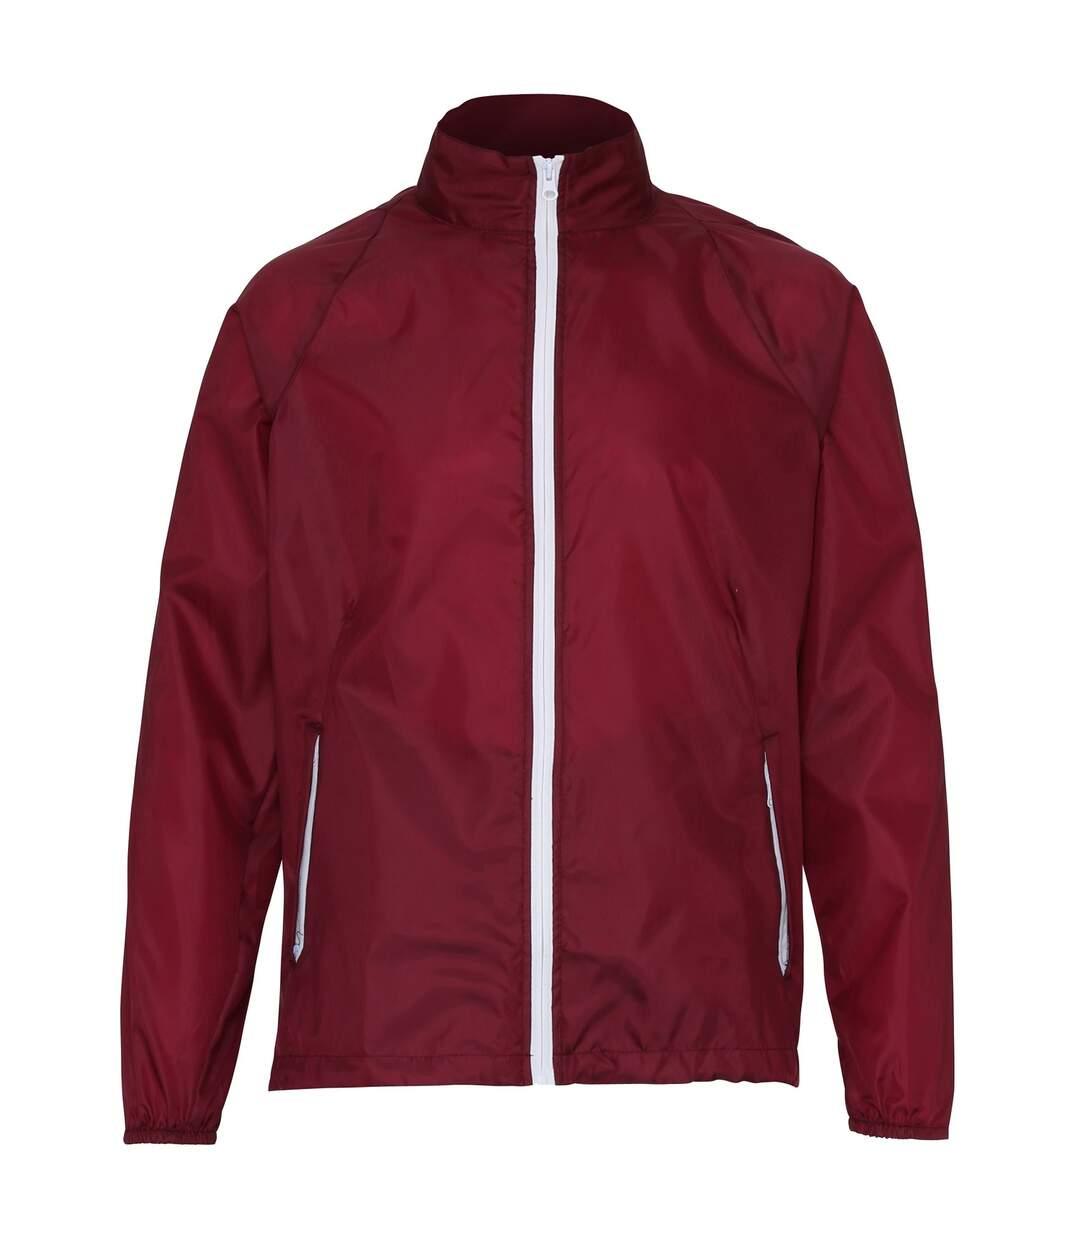 2786 Mens Contrast Lightweight Windcheater Shower Proof Jacket (Pack of 2) (Burgundy/ White) - UTRW7001